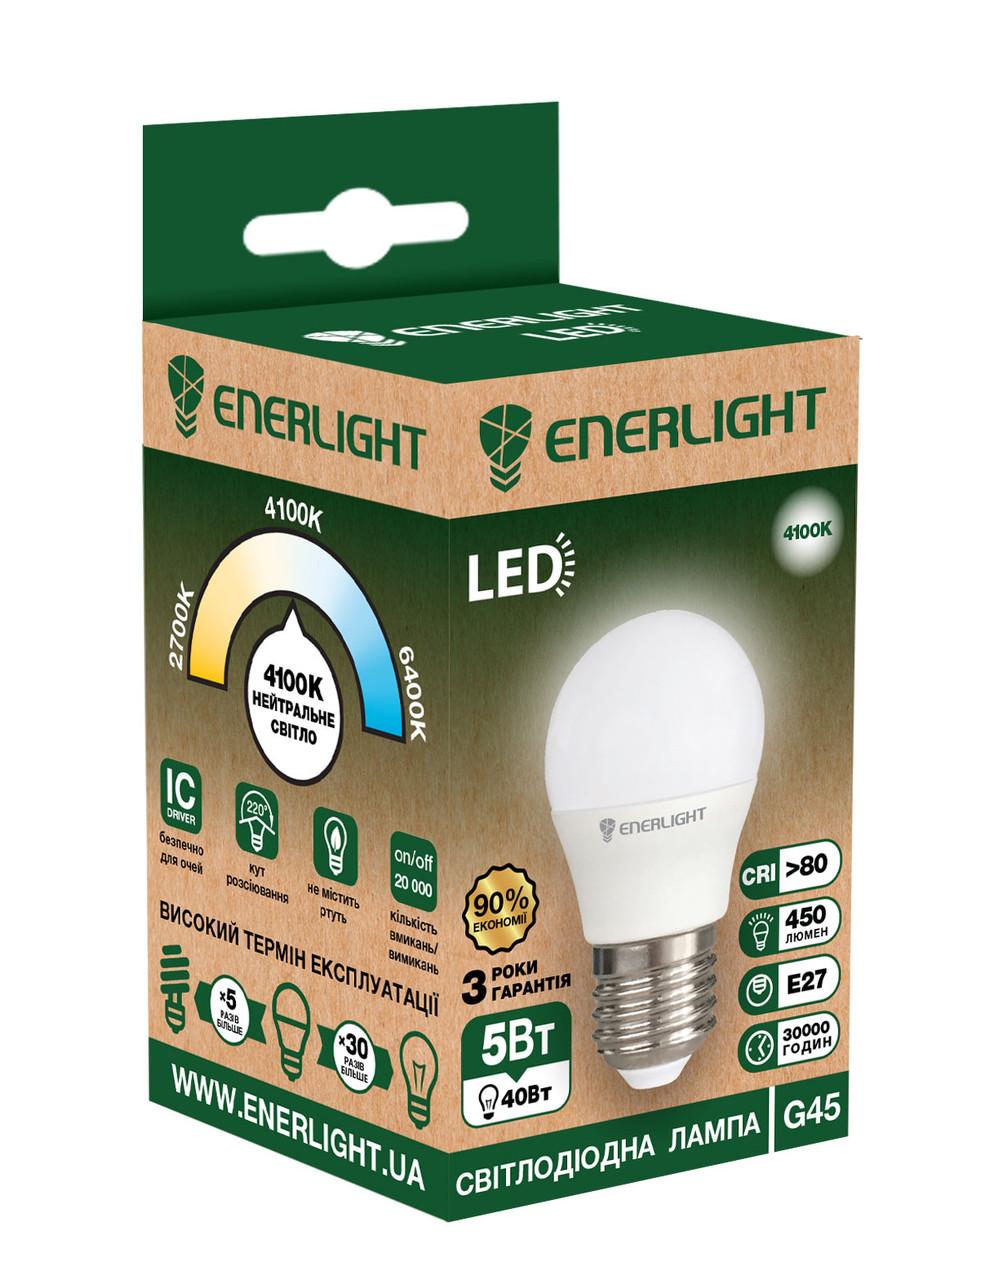 LED лампа Enerlight G45 5W 4100K E27